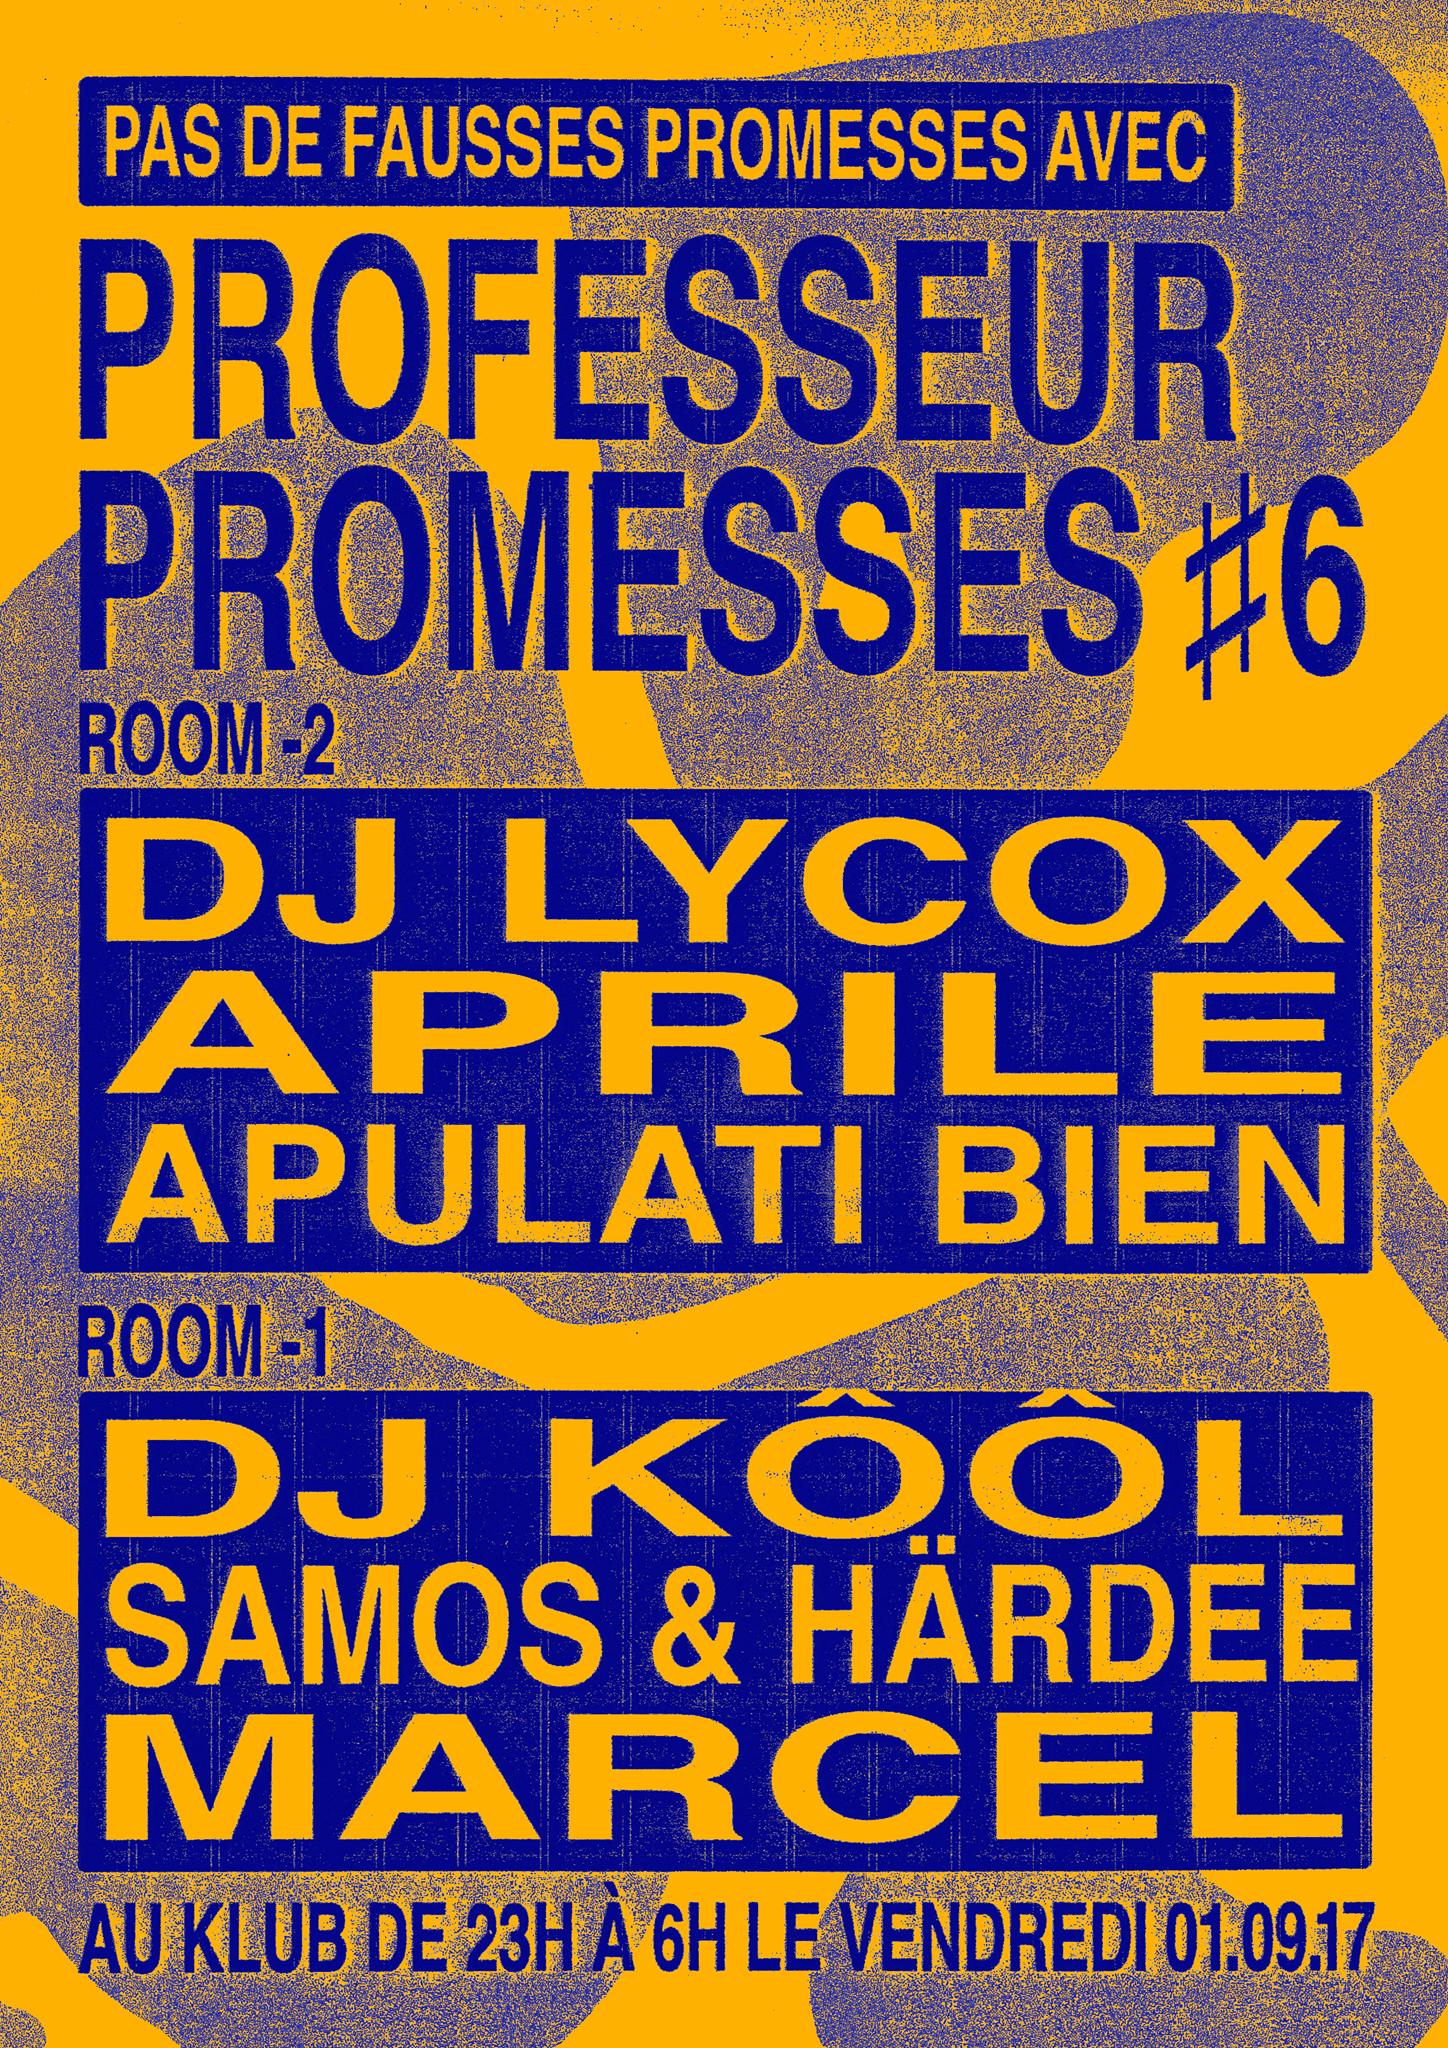 Professeur Promesses #6 ■ 01.09